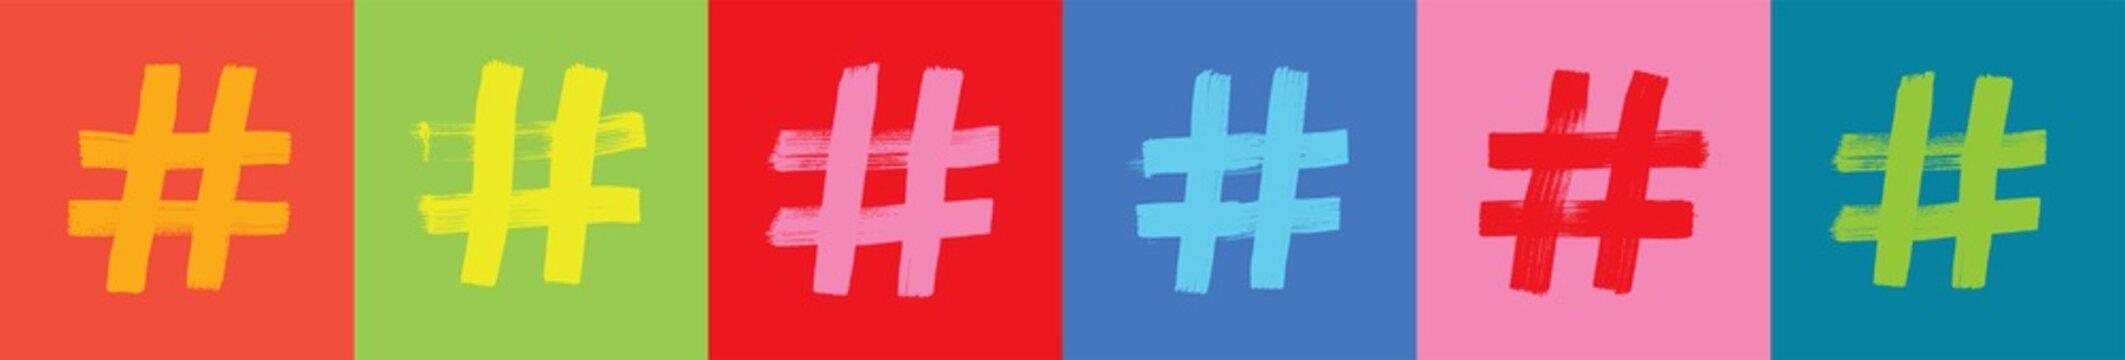 Colorful Hashtag Web Banner, Social Media Concept